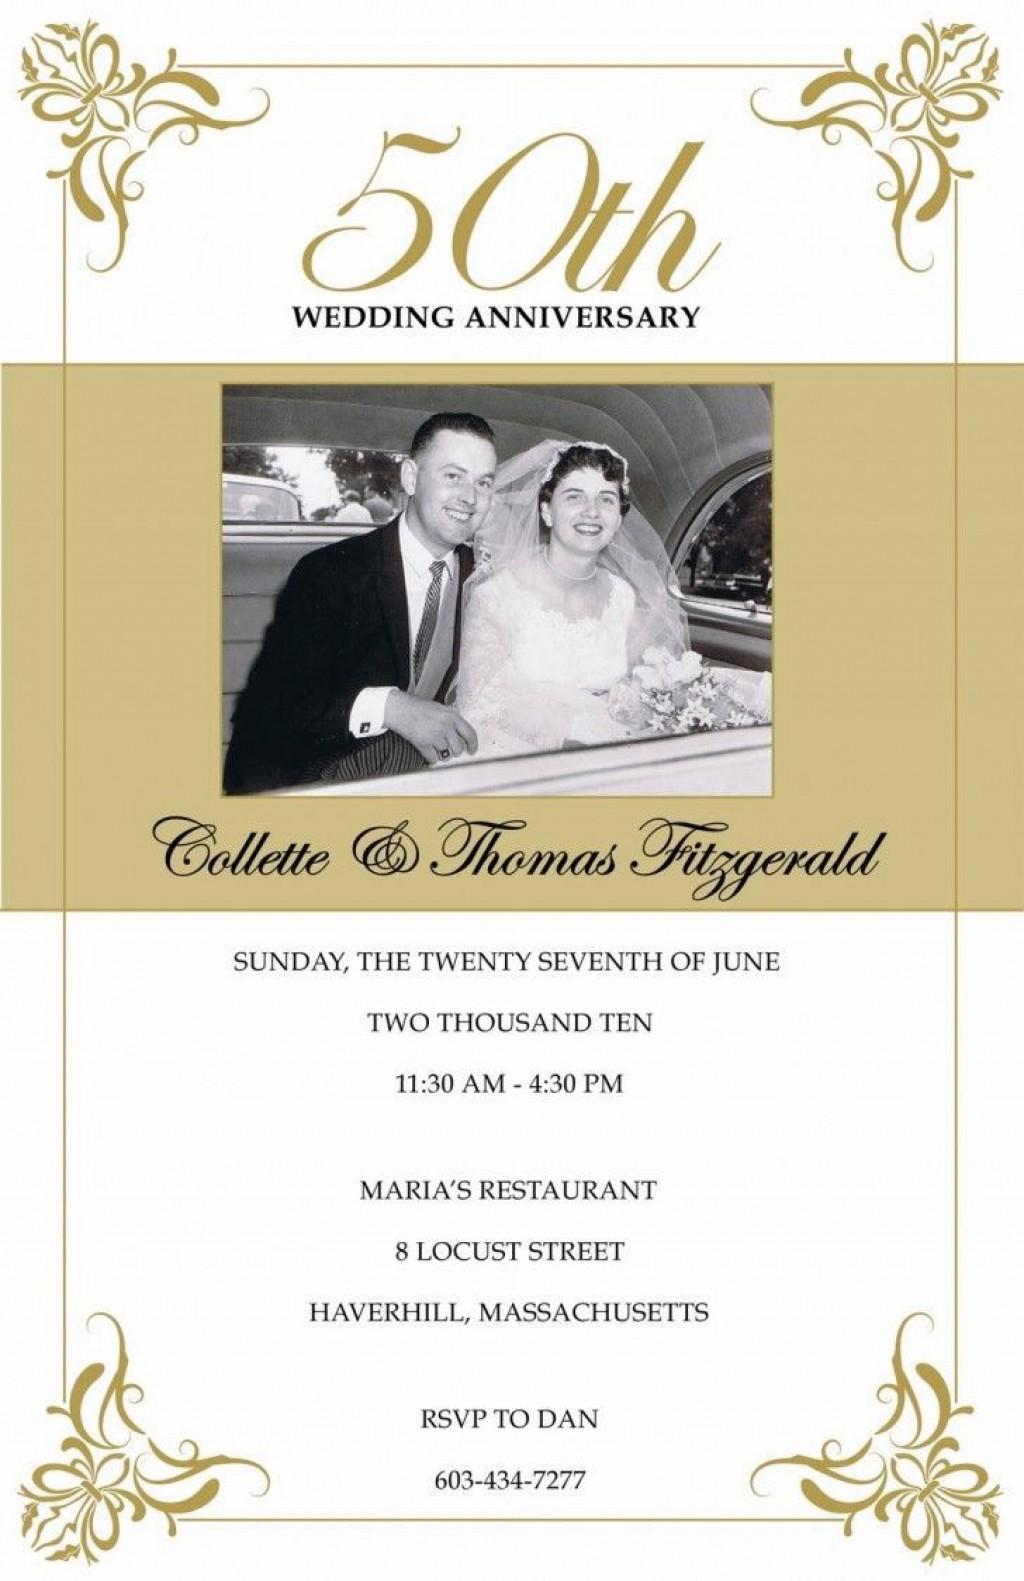 006 Shocking 50th Anniversary Invitation Wording Sample  Samples Wedding CardLarge